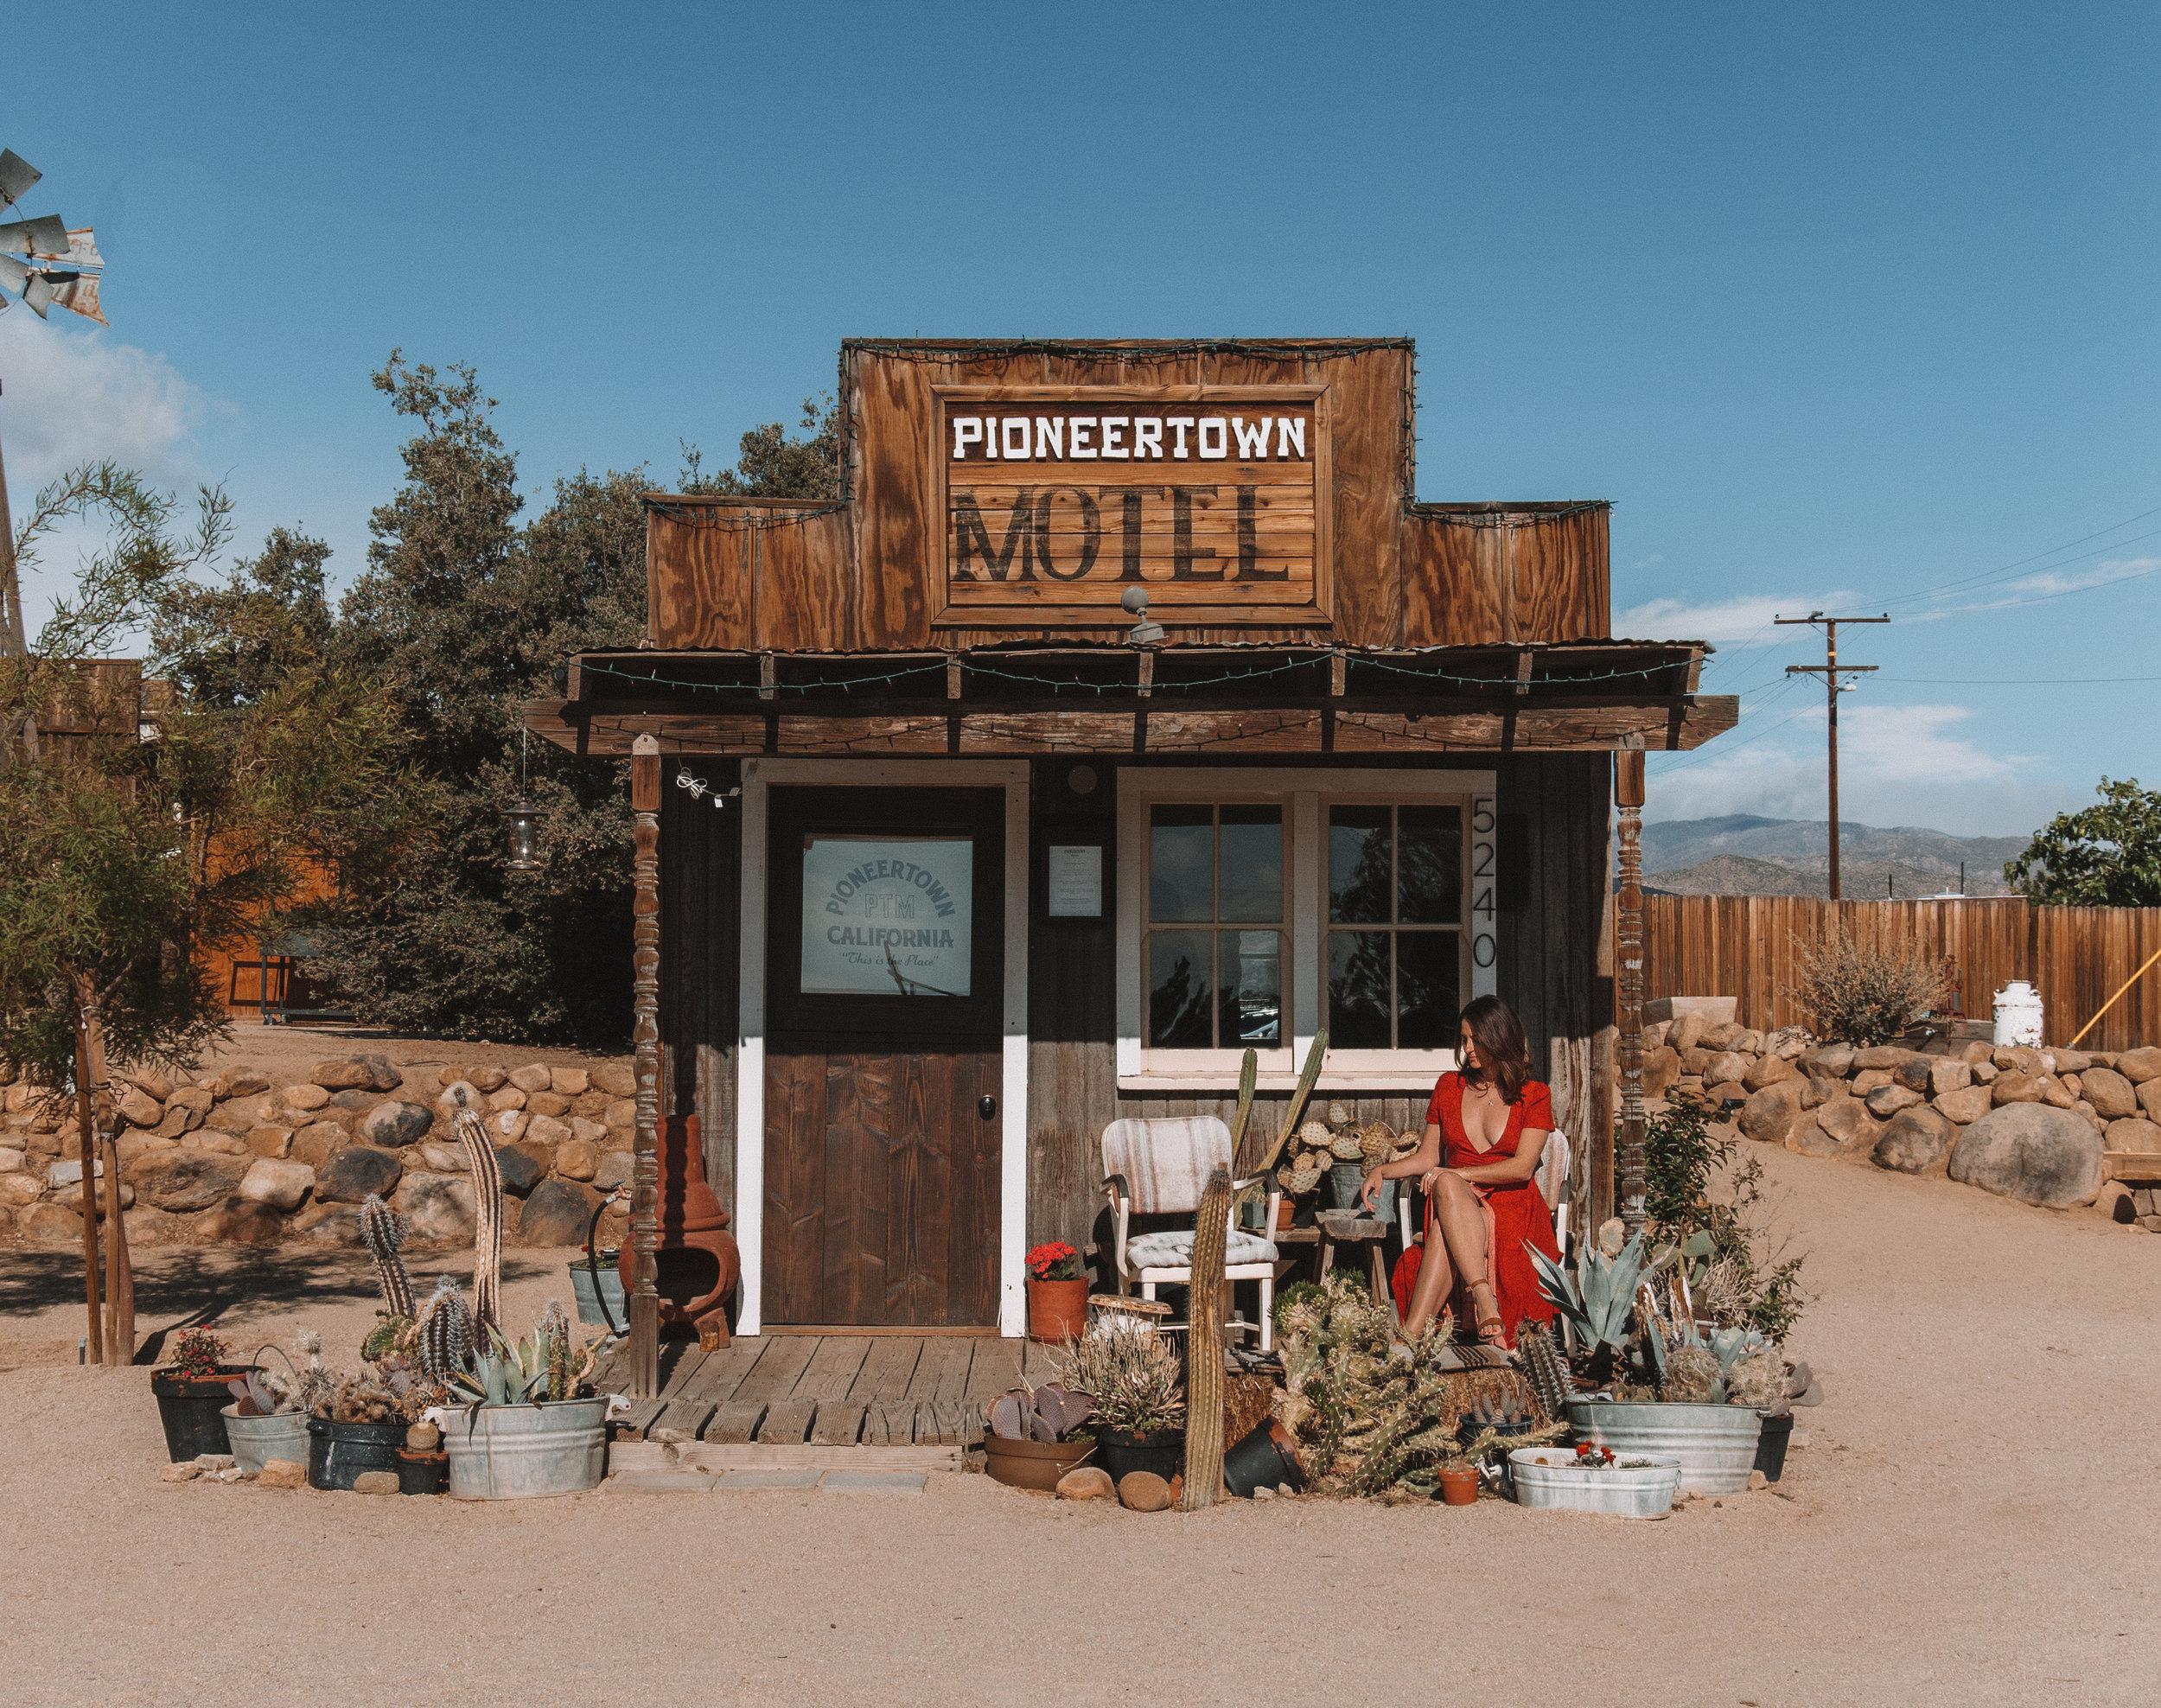 Pioneertown Motel